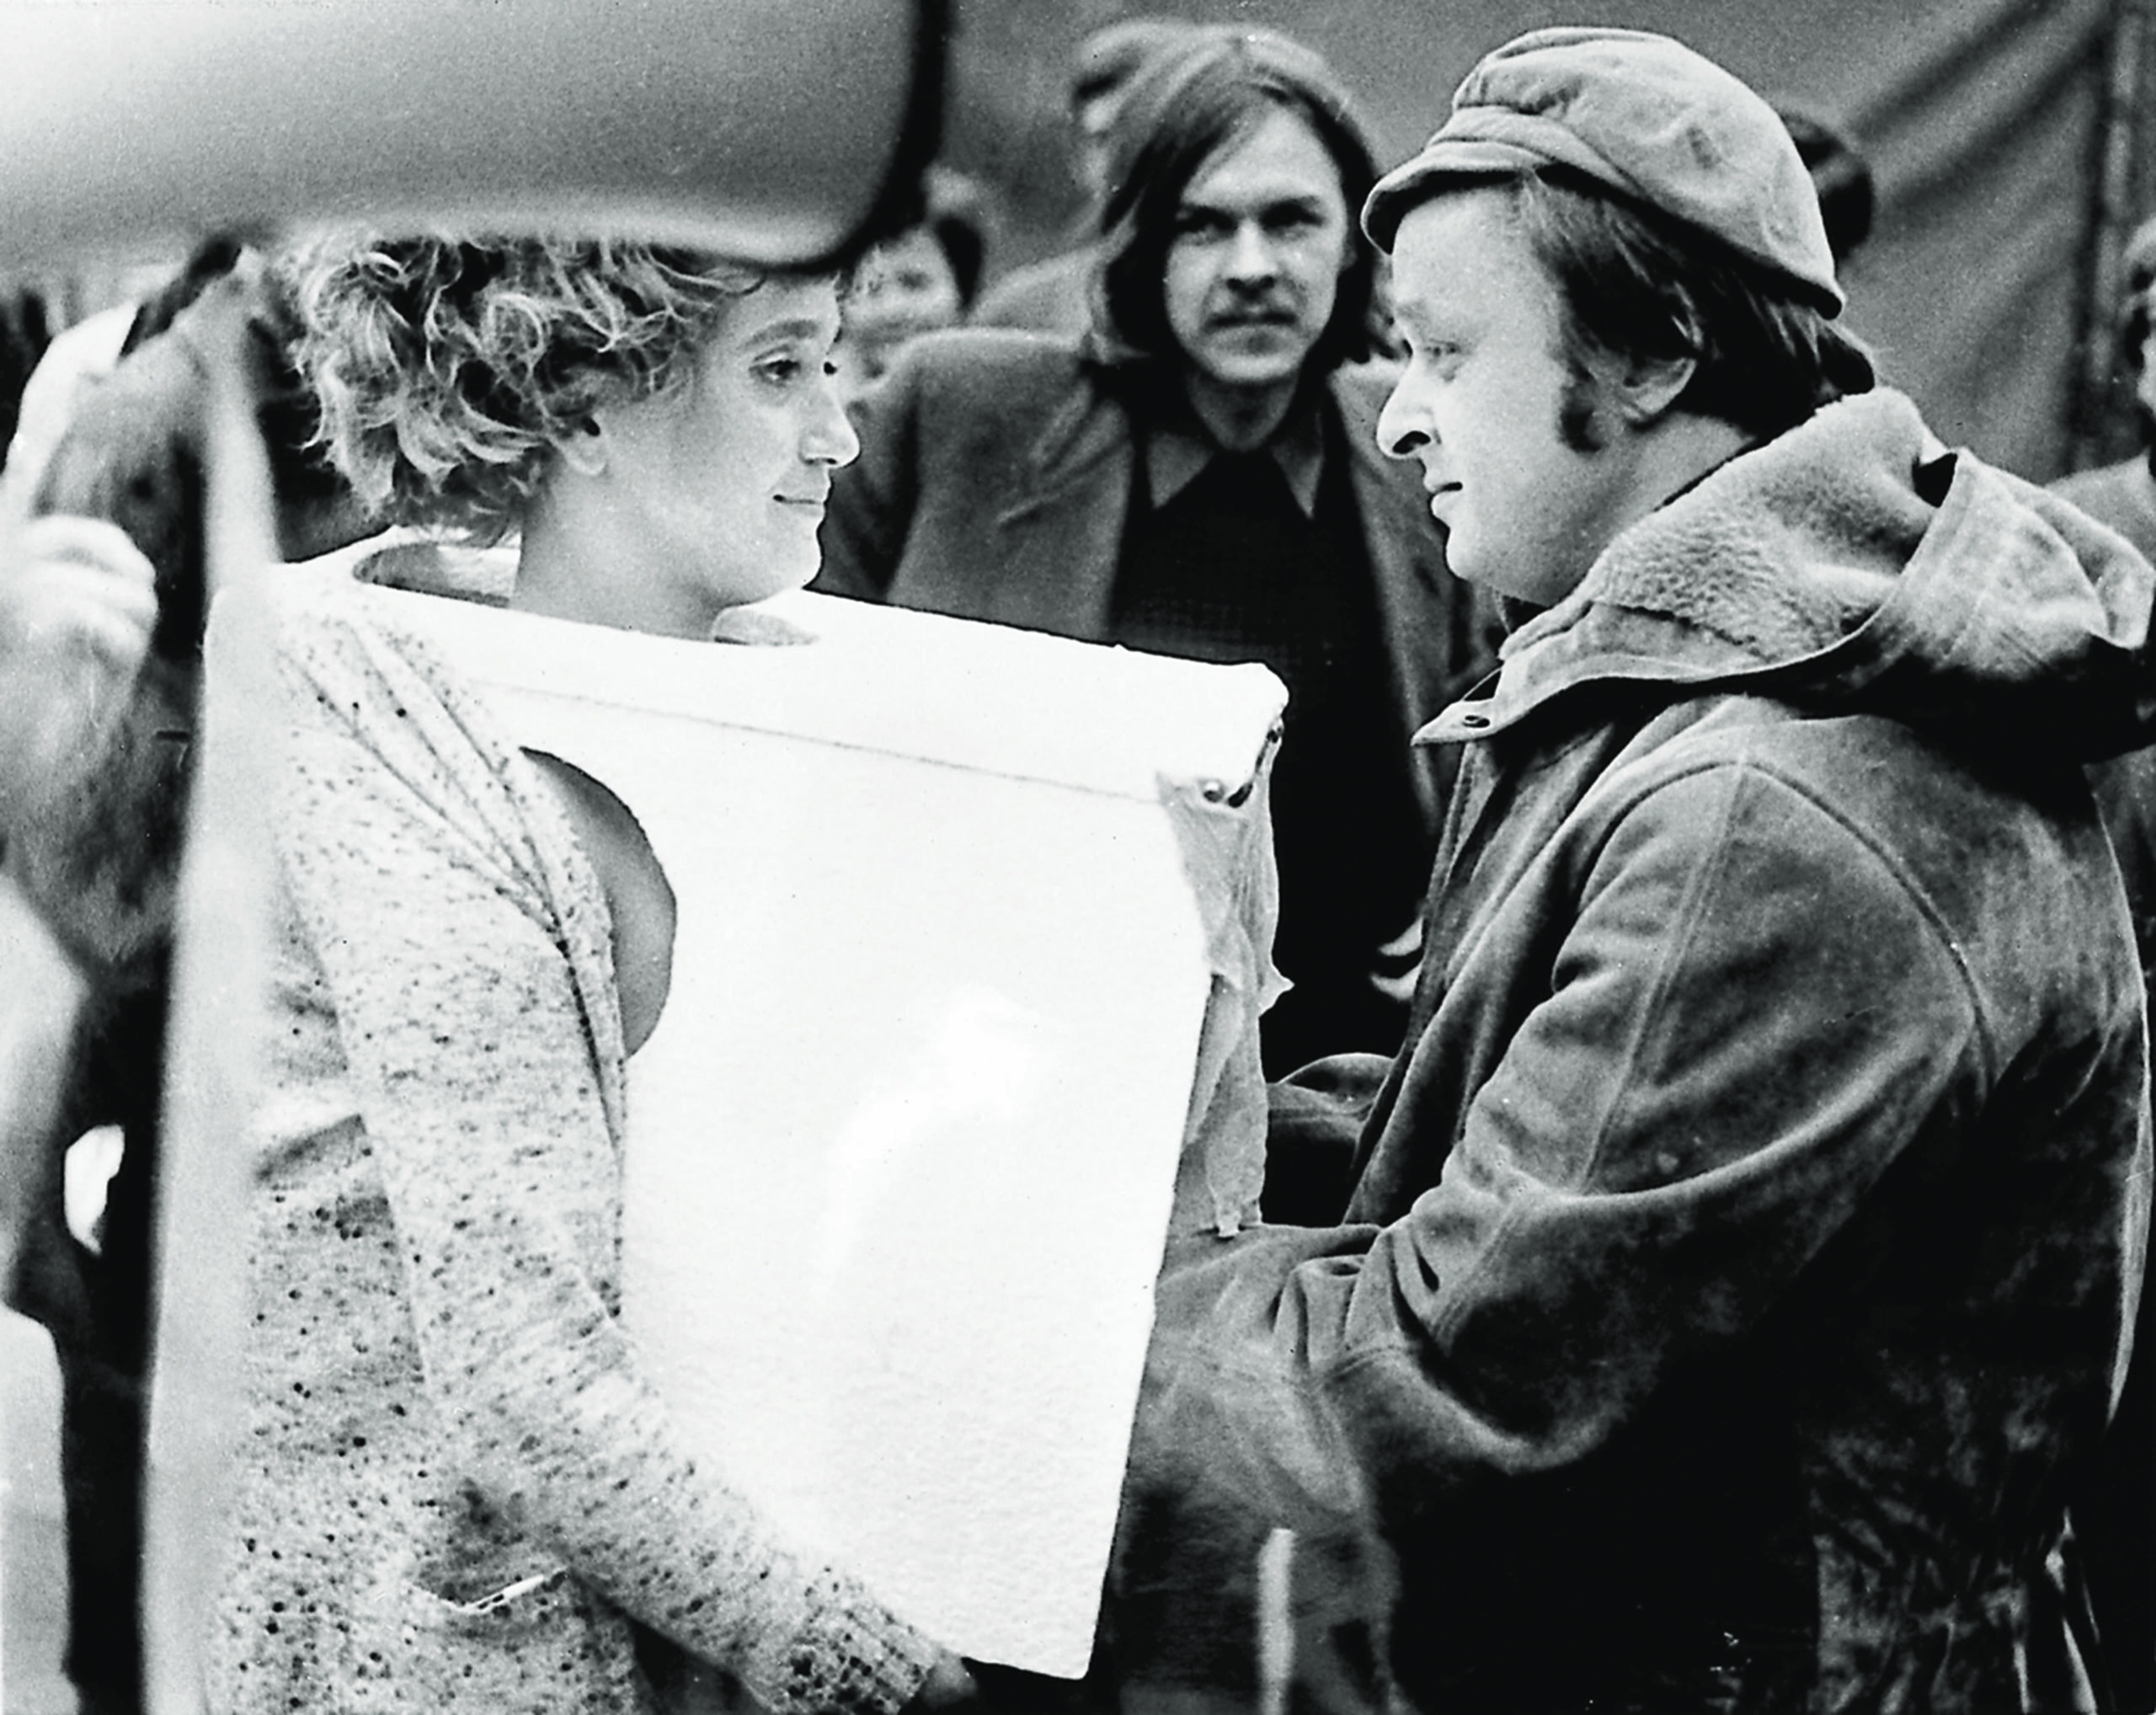 05_pressimage-feminist-avant-garde-l-valie-export-tapp-und-tastkino-1968